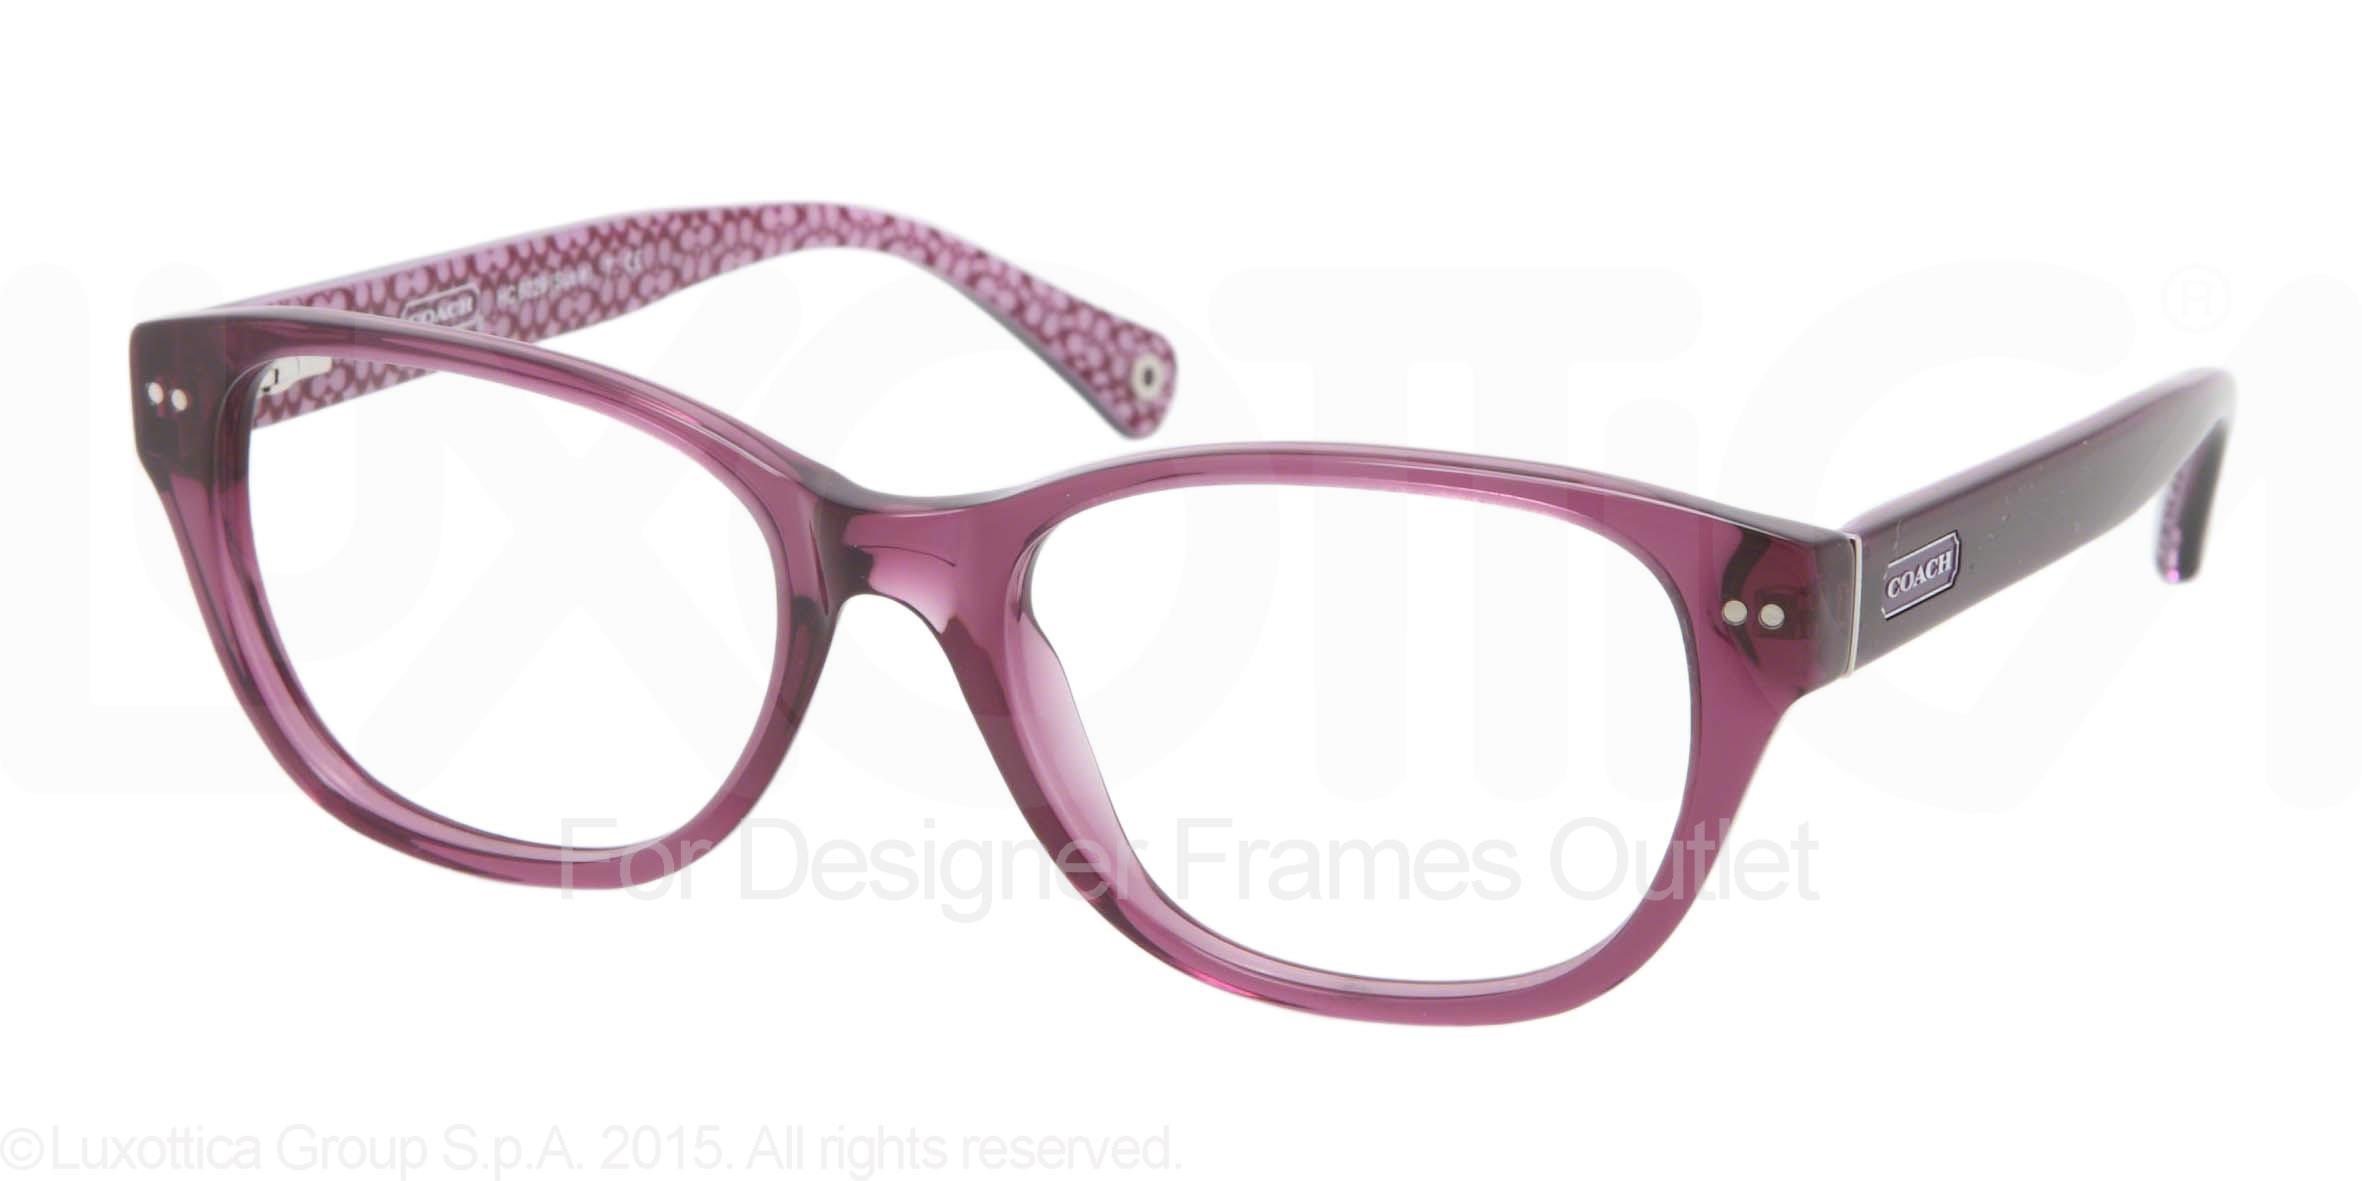 5043 Purple